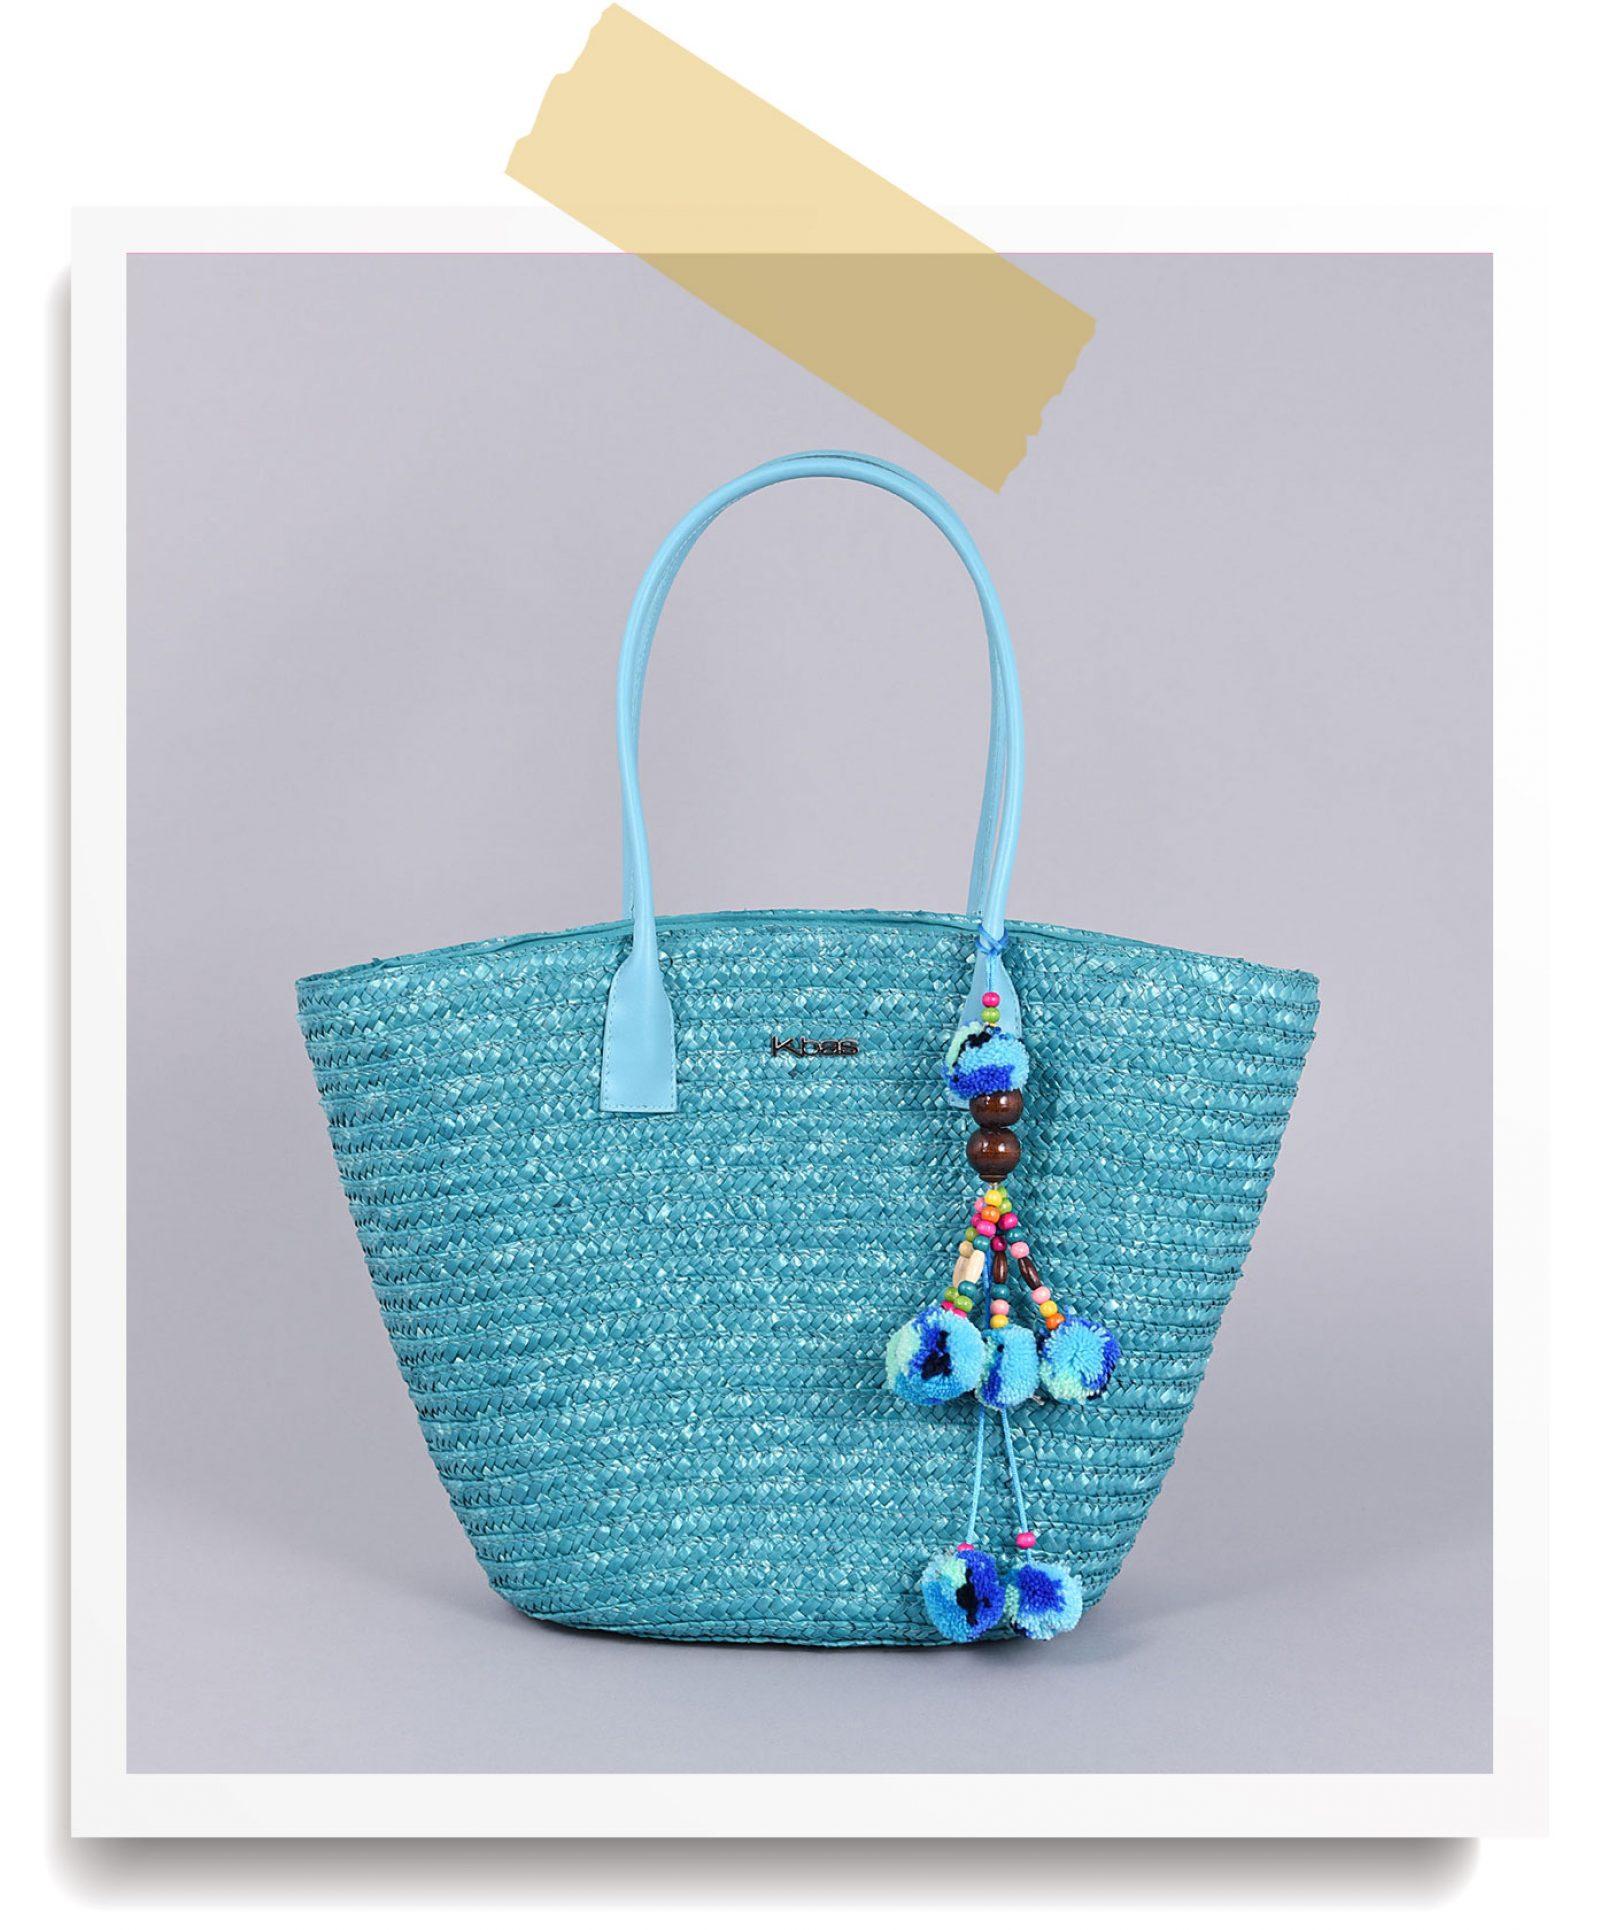 http://lookbook.allee-du-foulard.fr/wp-content/uploads/2018/06/0680-ADF-Accessoires-de-mode-LB-Soldes-Ete-panier-bleu-1600x1930.jpg